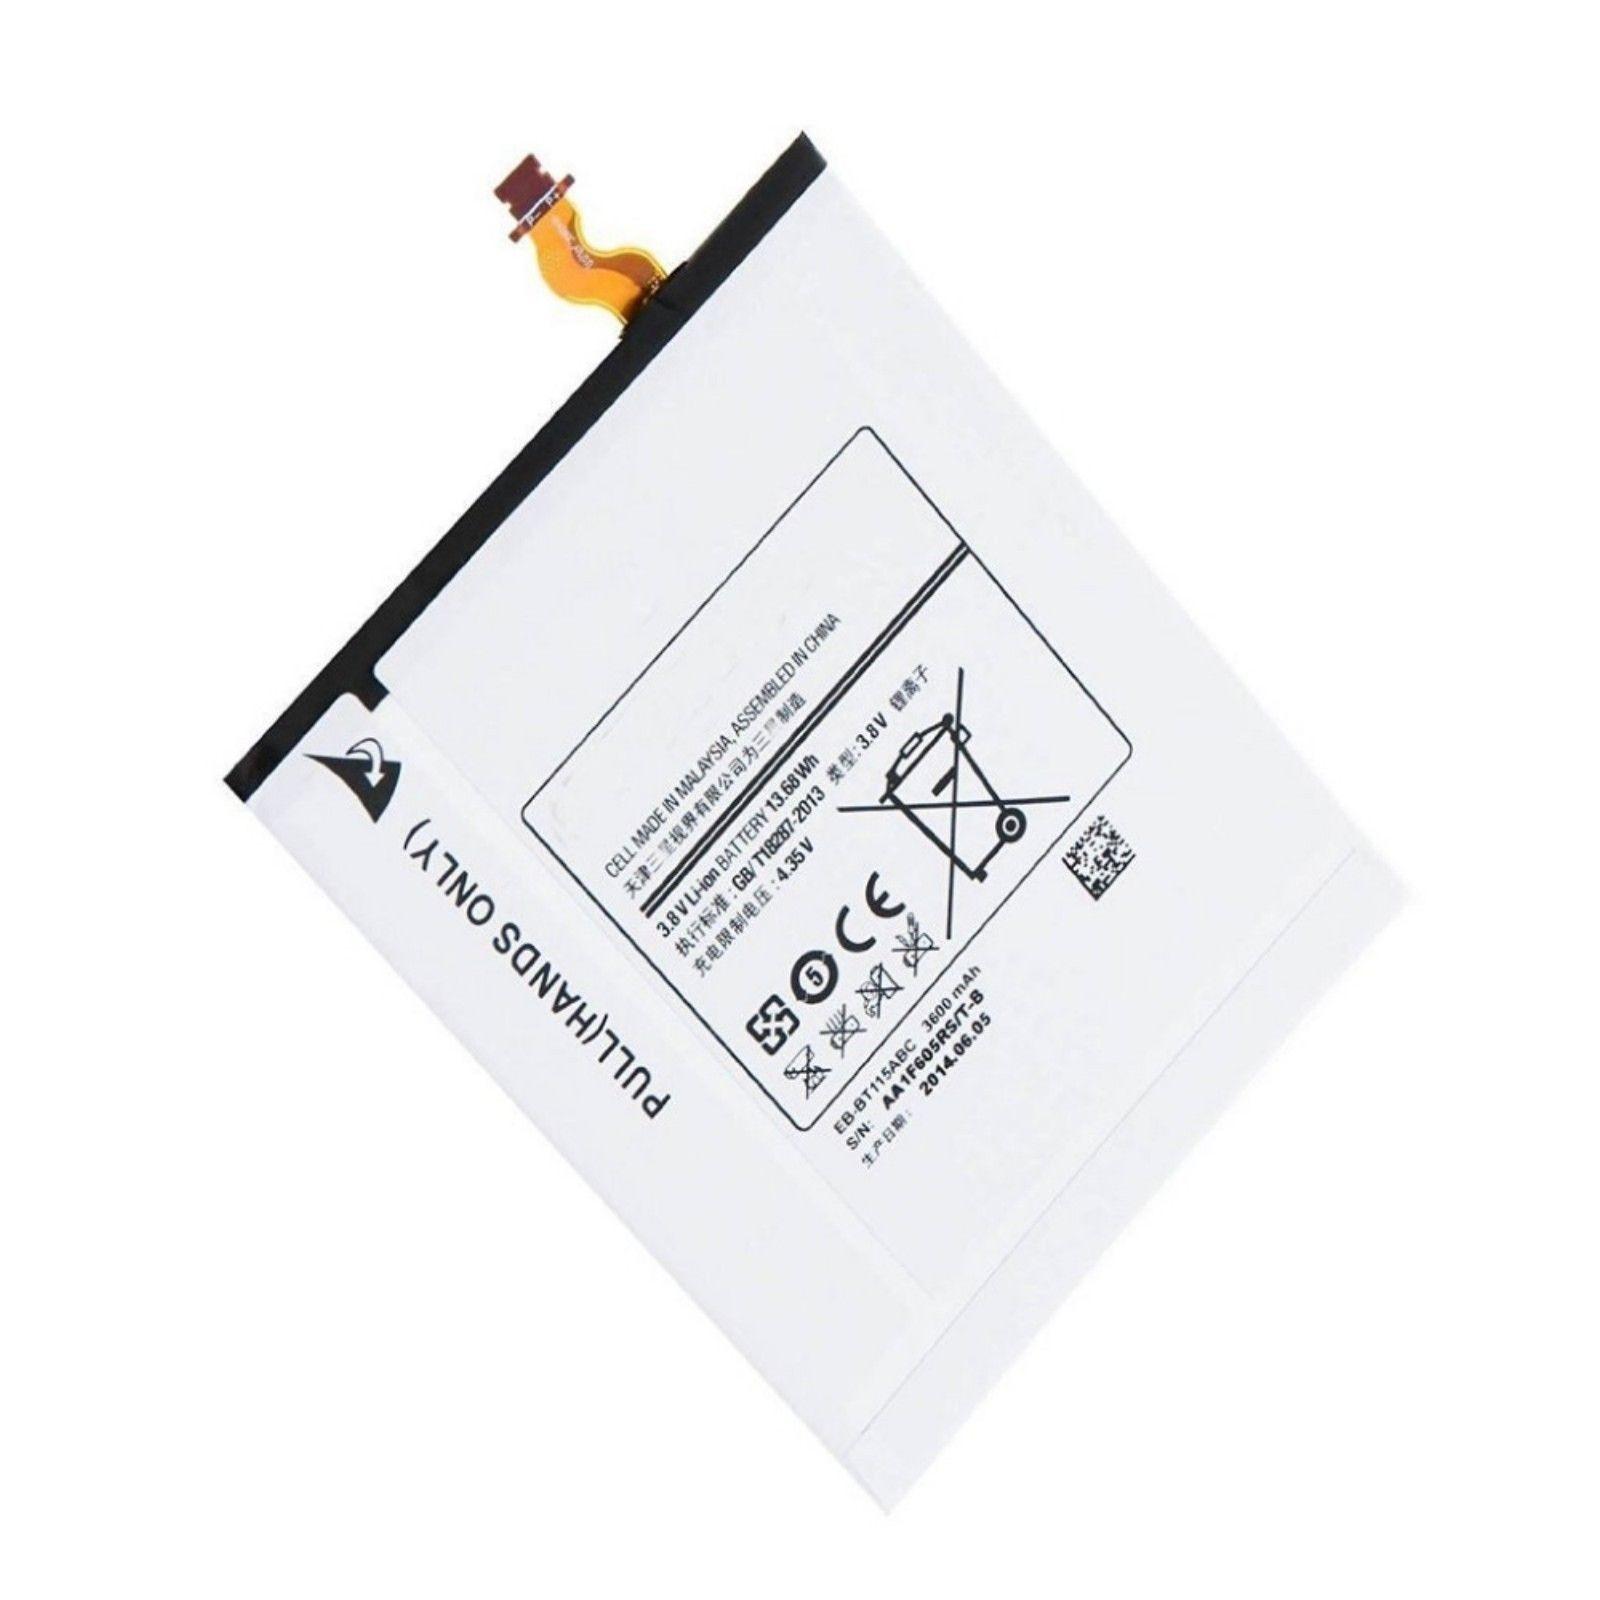 BATTERIA ORIGINALE SAMSUNG EB-BT115 3600mAh PER GALAXY TAB